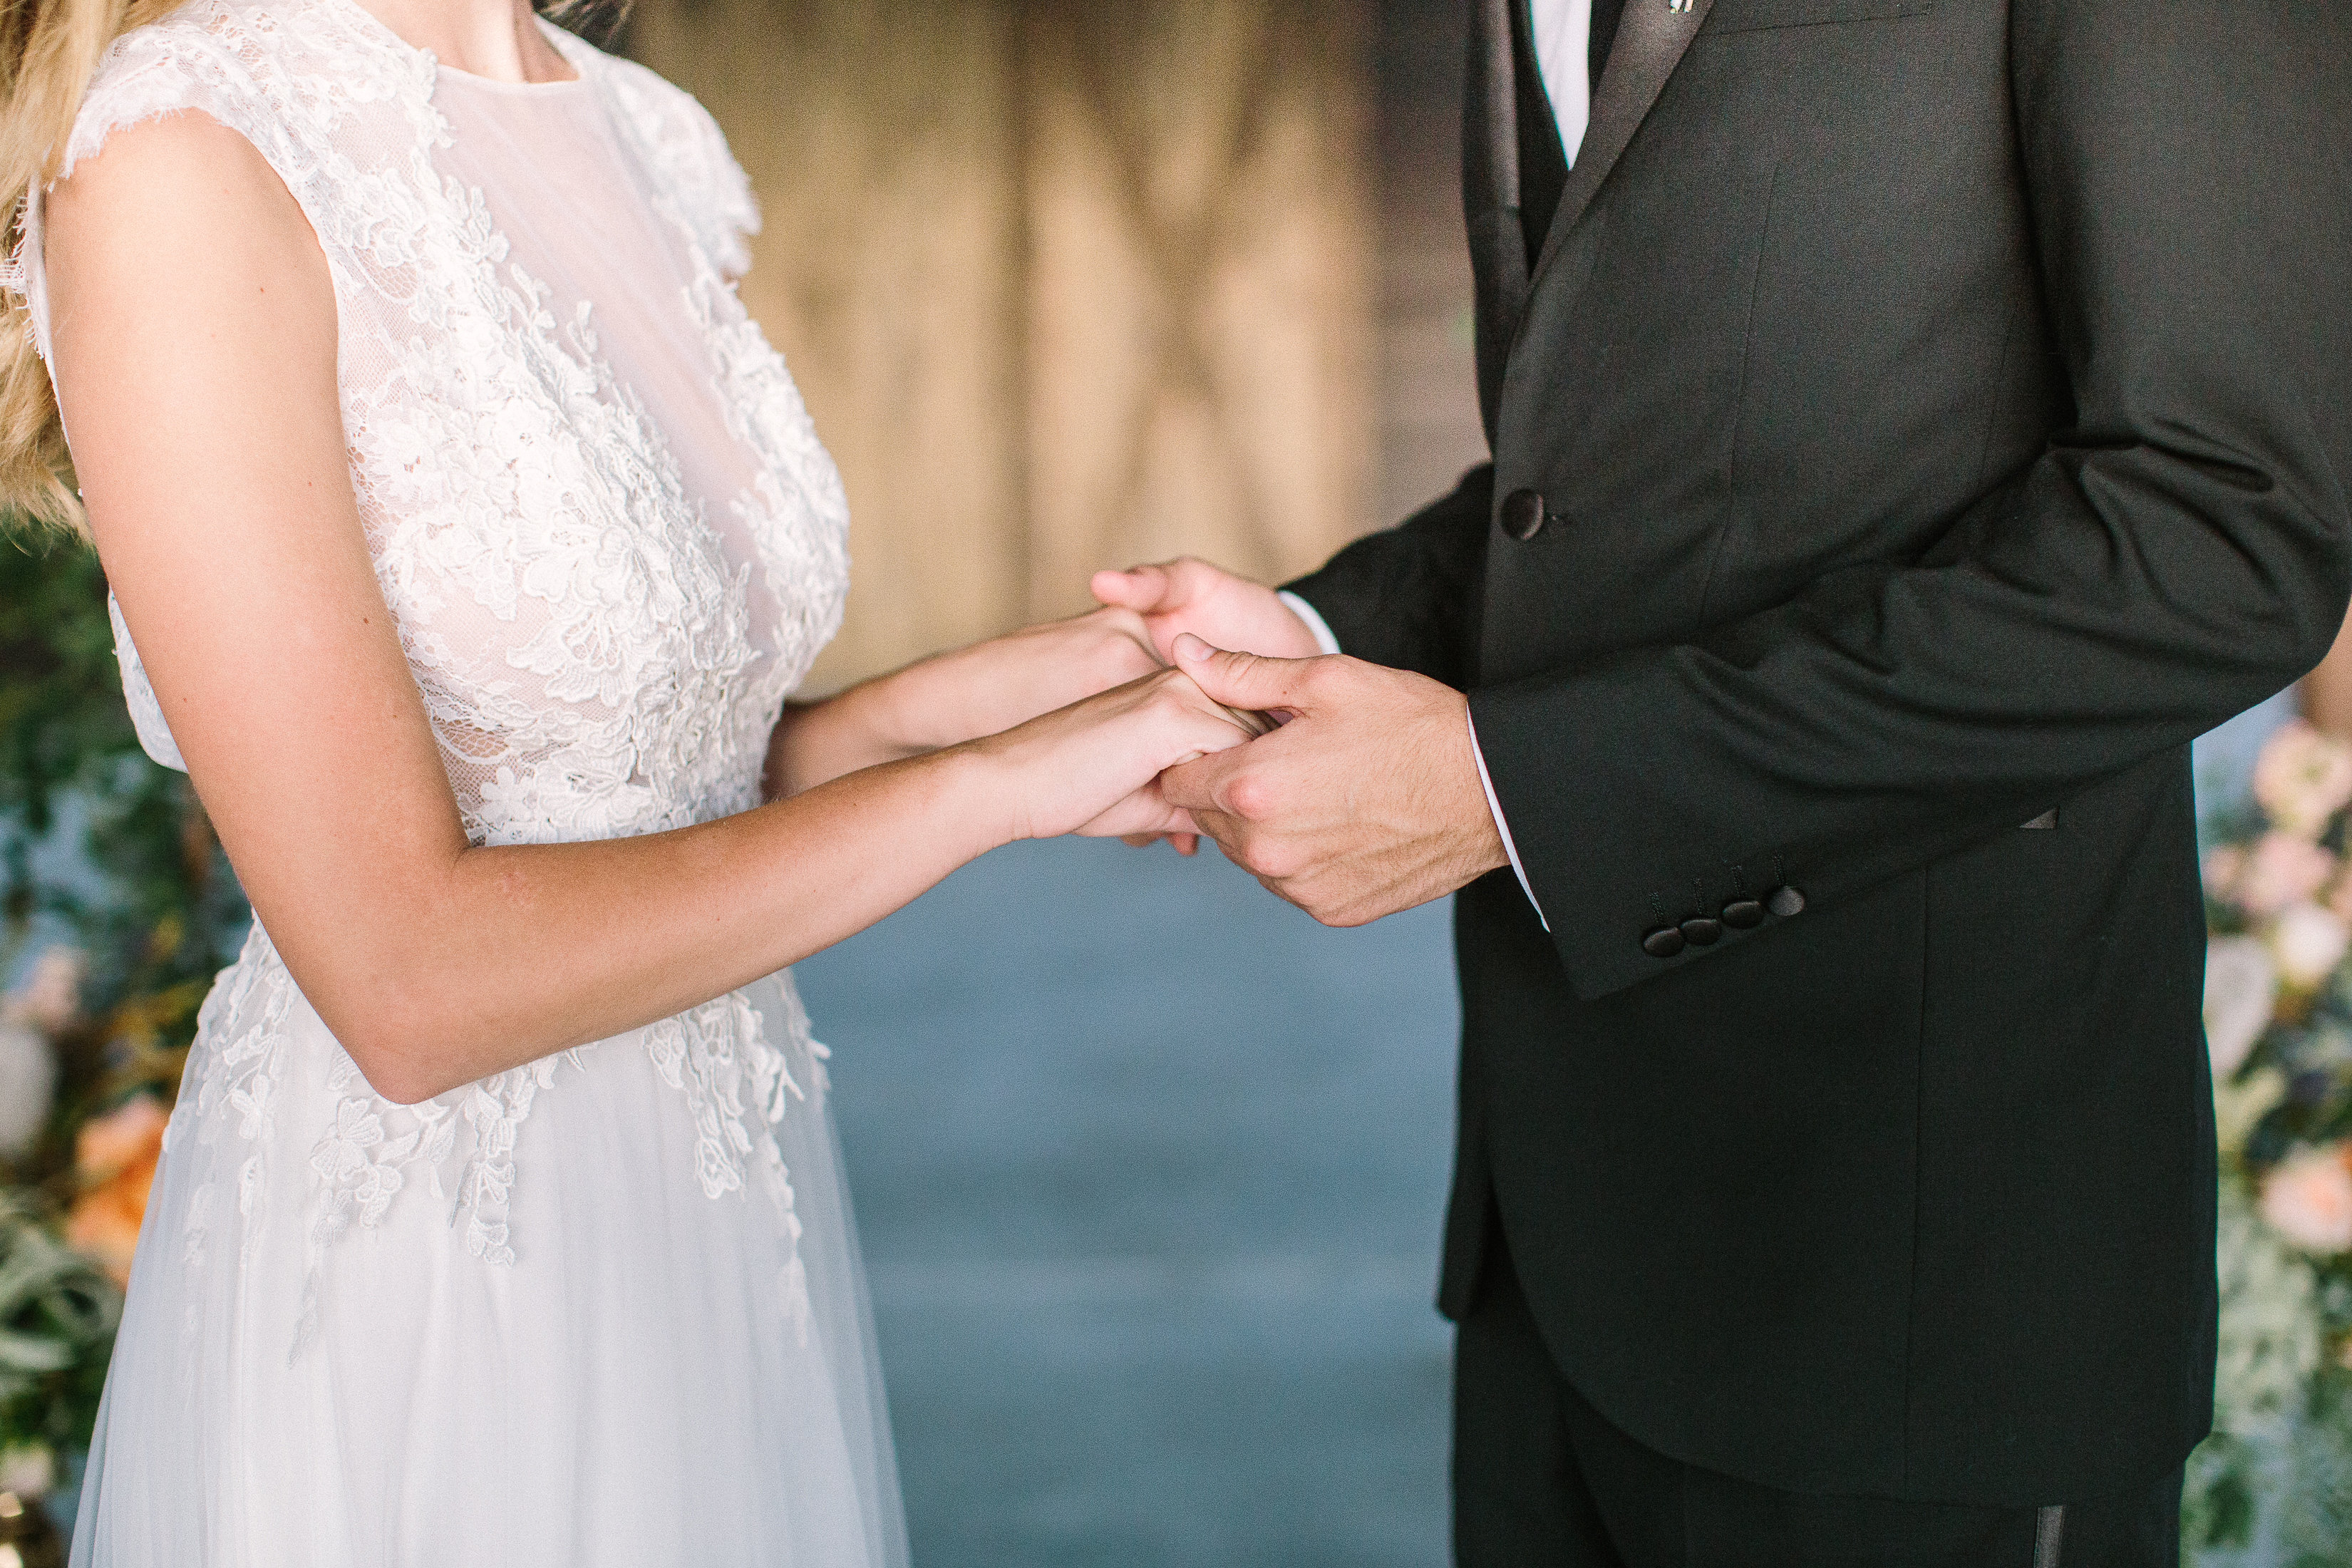 Ellen-Ashton-Photography-Peach-Creek-Ranch-Weddings-Wed-and-Prosper376